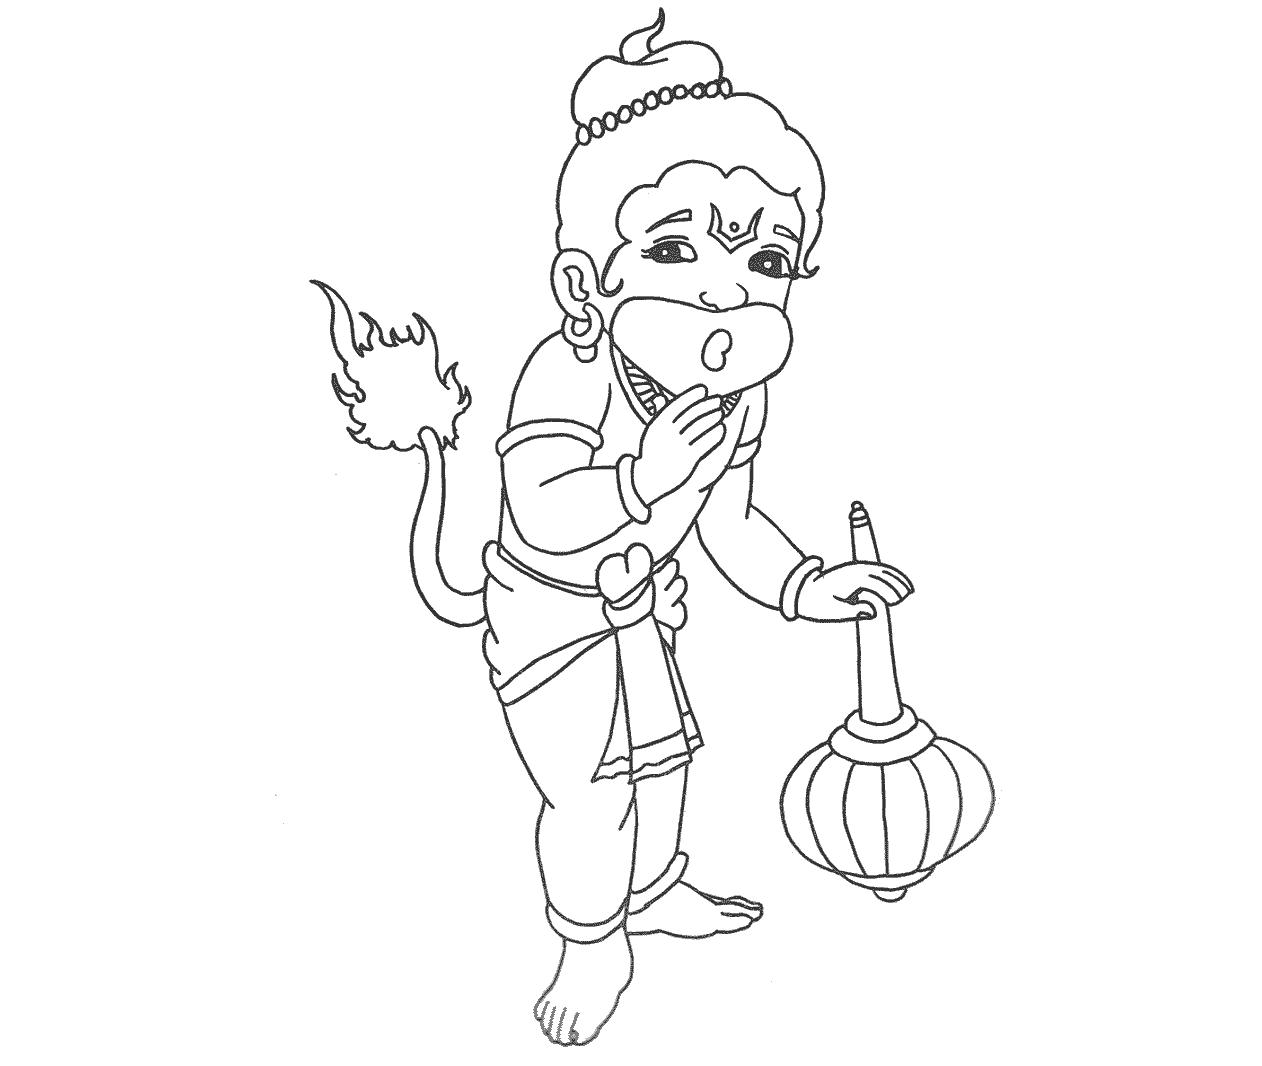 Lord Hanuman Coloring Drawing Free Wallpaper | Anggela Coloring Book For Free